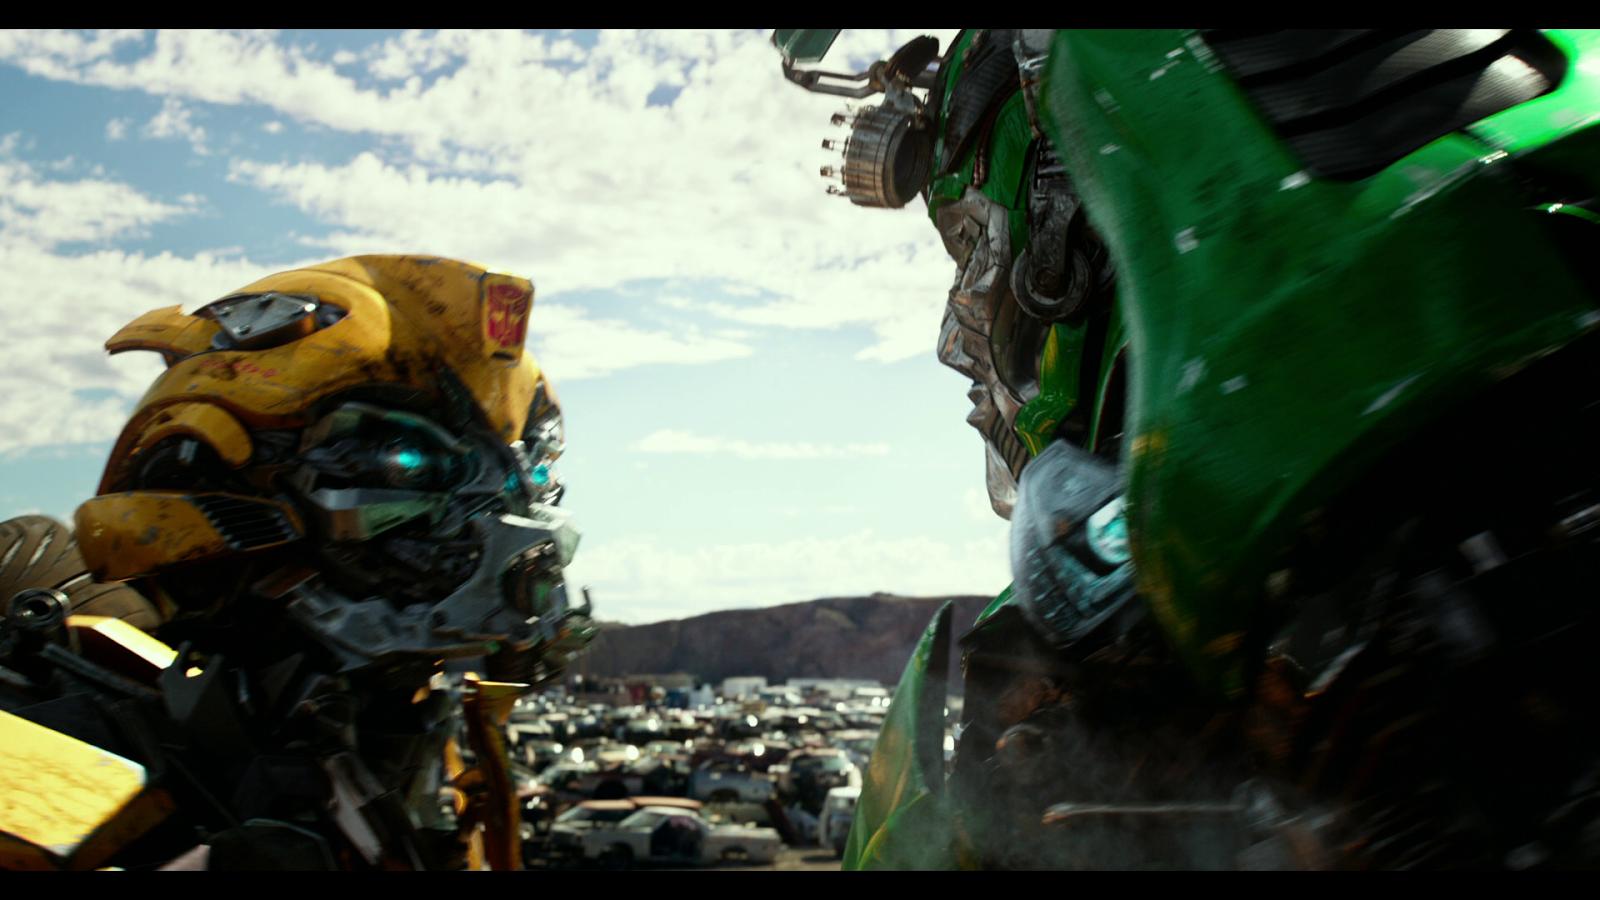 Transformers El Ultimo Caballero (2017) 1080p BD25 LATINO 3